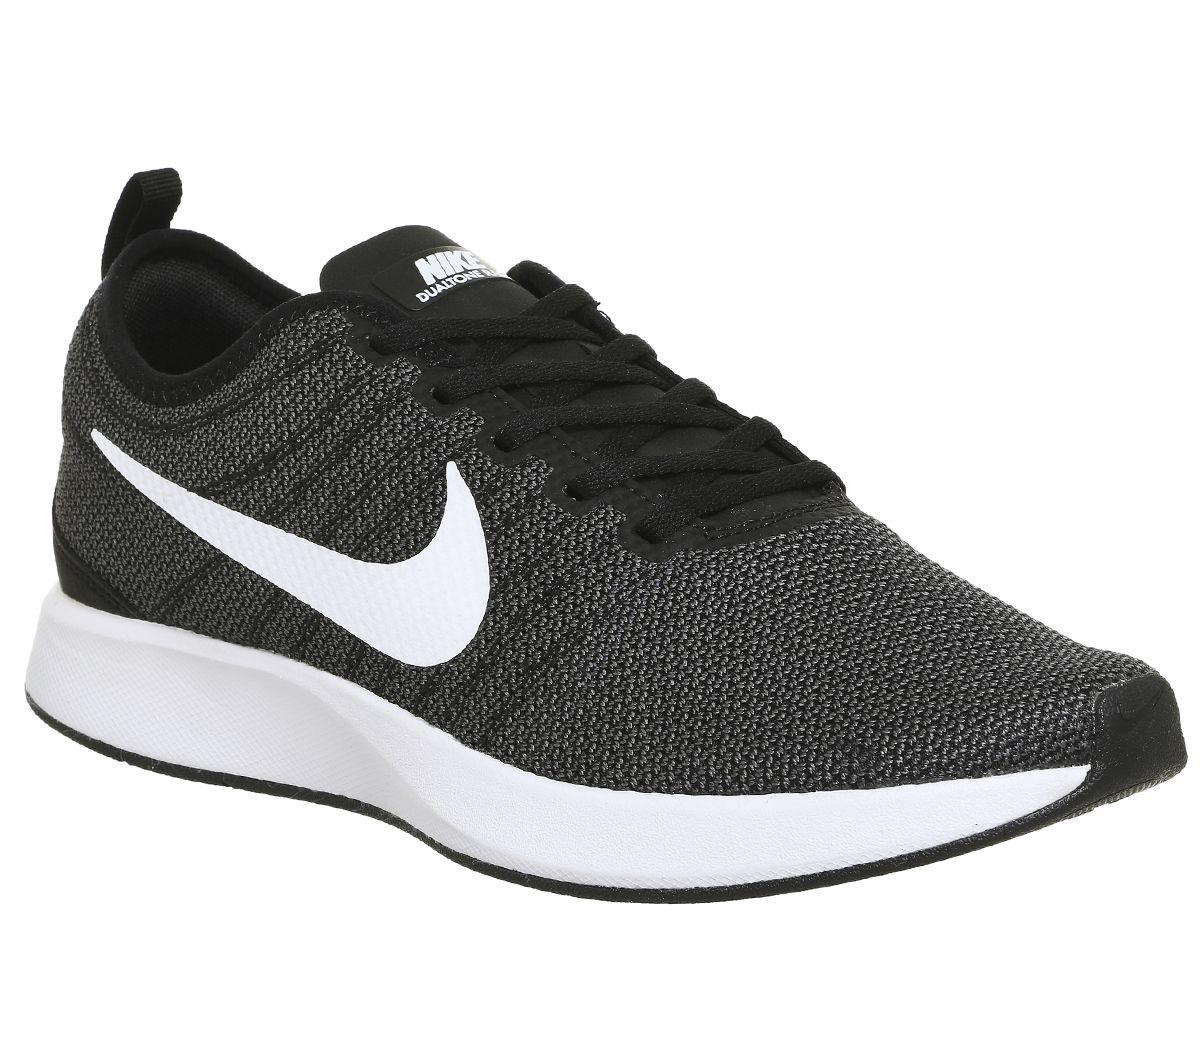 9383004078770 Nike Dualtone Racer Black White - Hers trainers